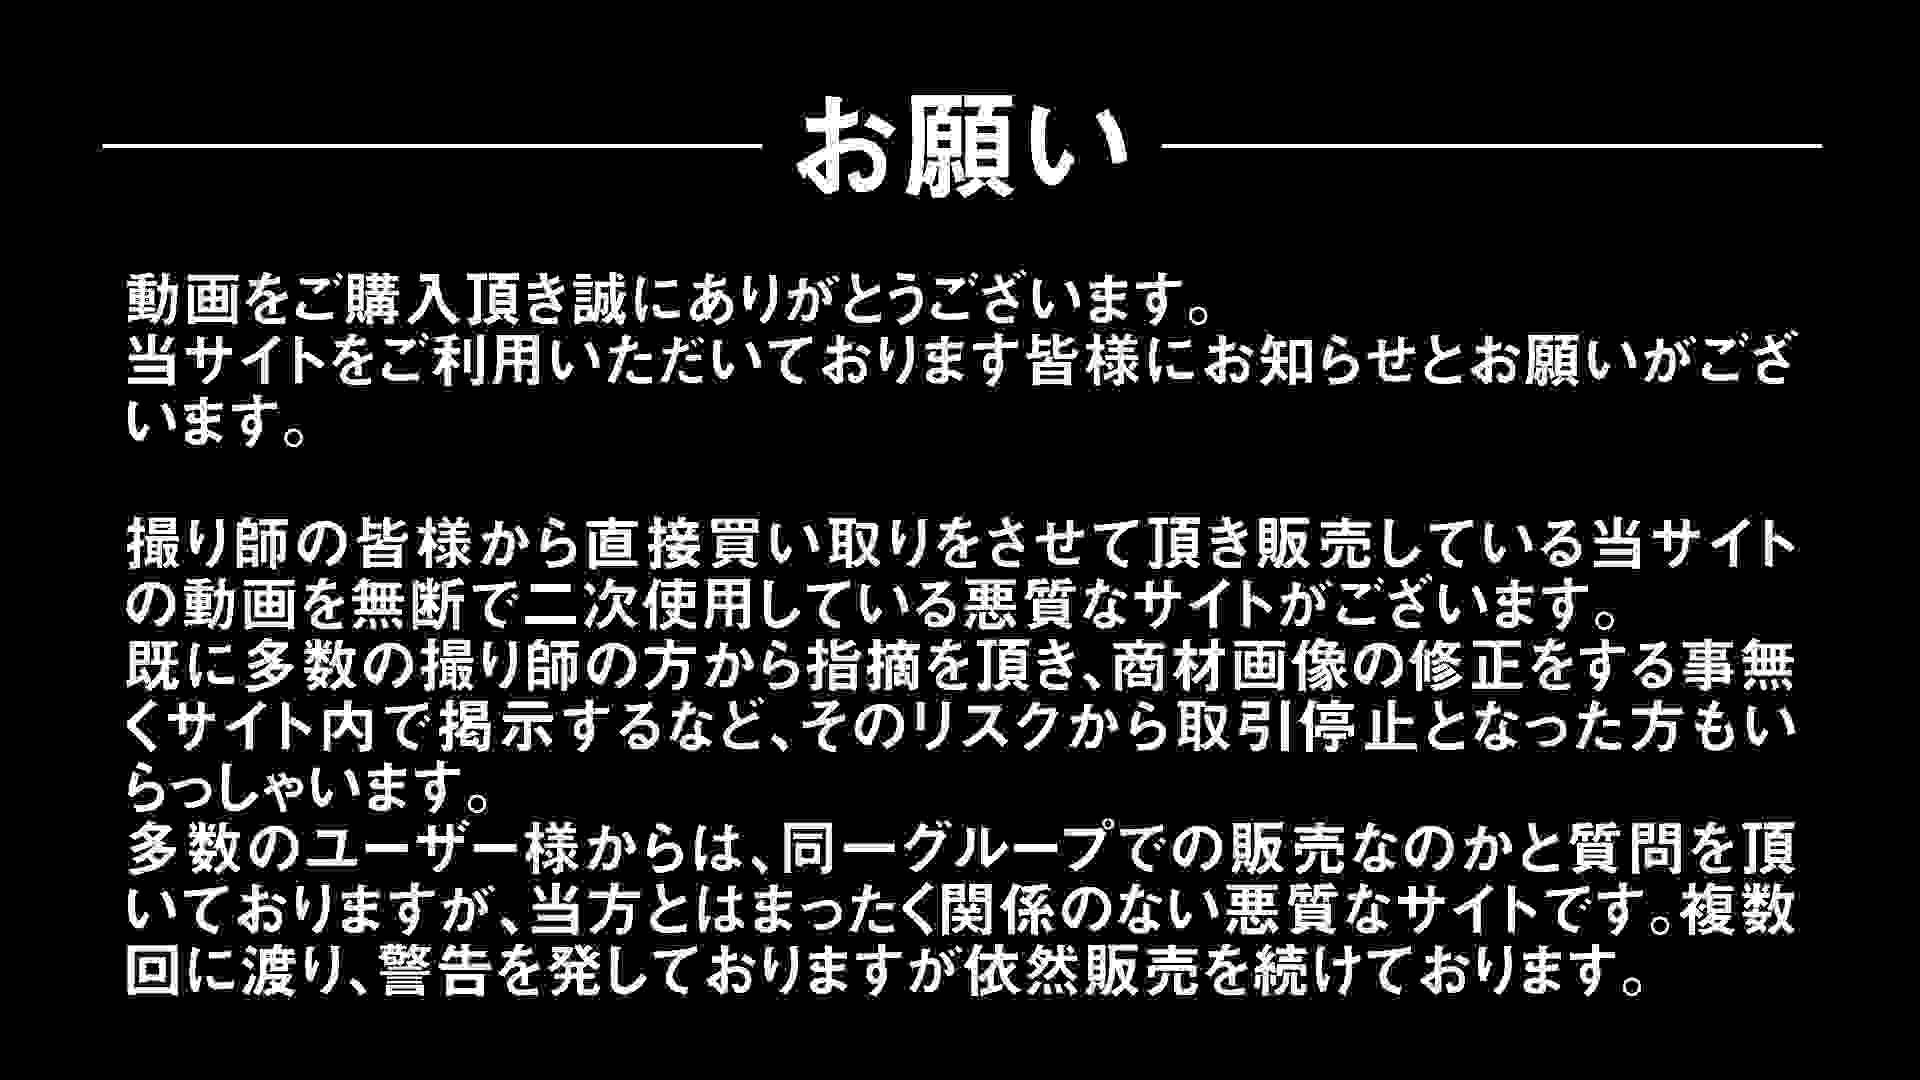 Aquaな露天風呂Vol.296 盗撮シリーズ   露天風呂編  102PIX 3